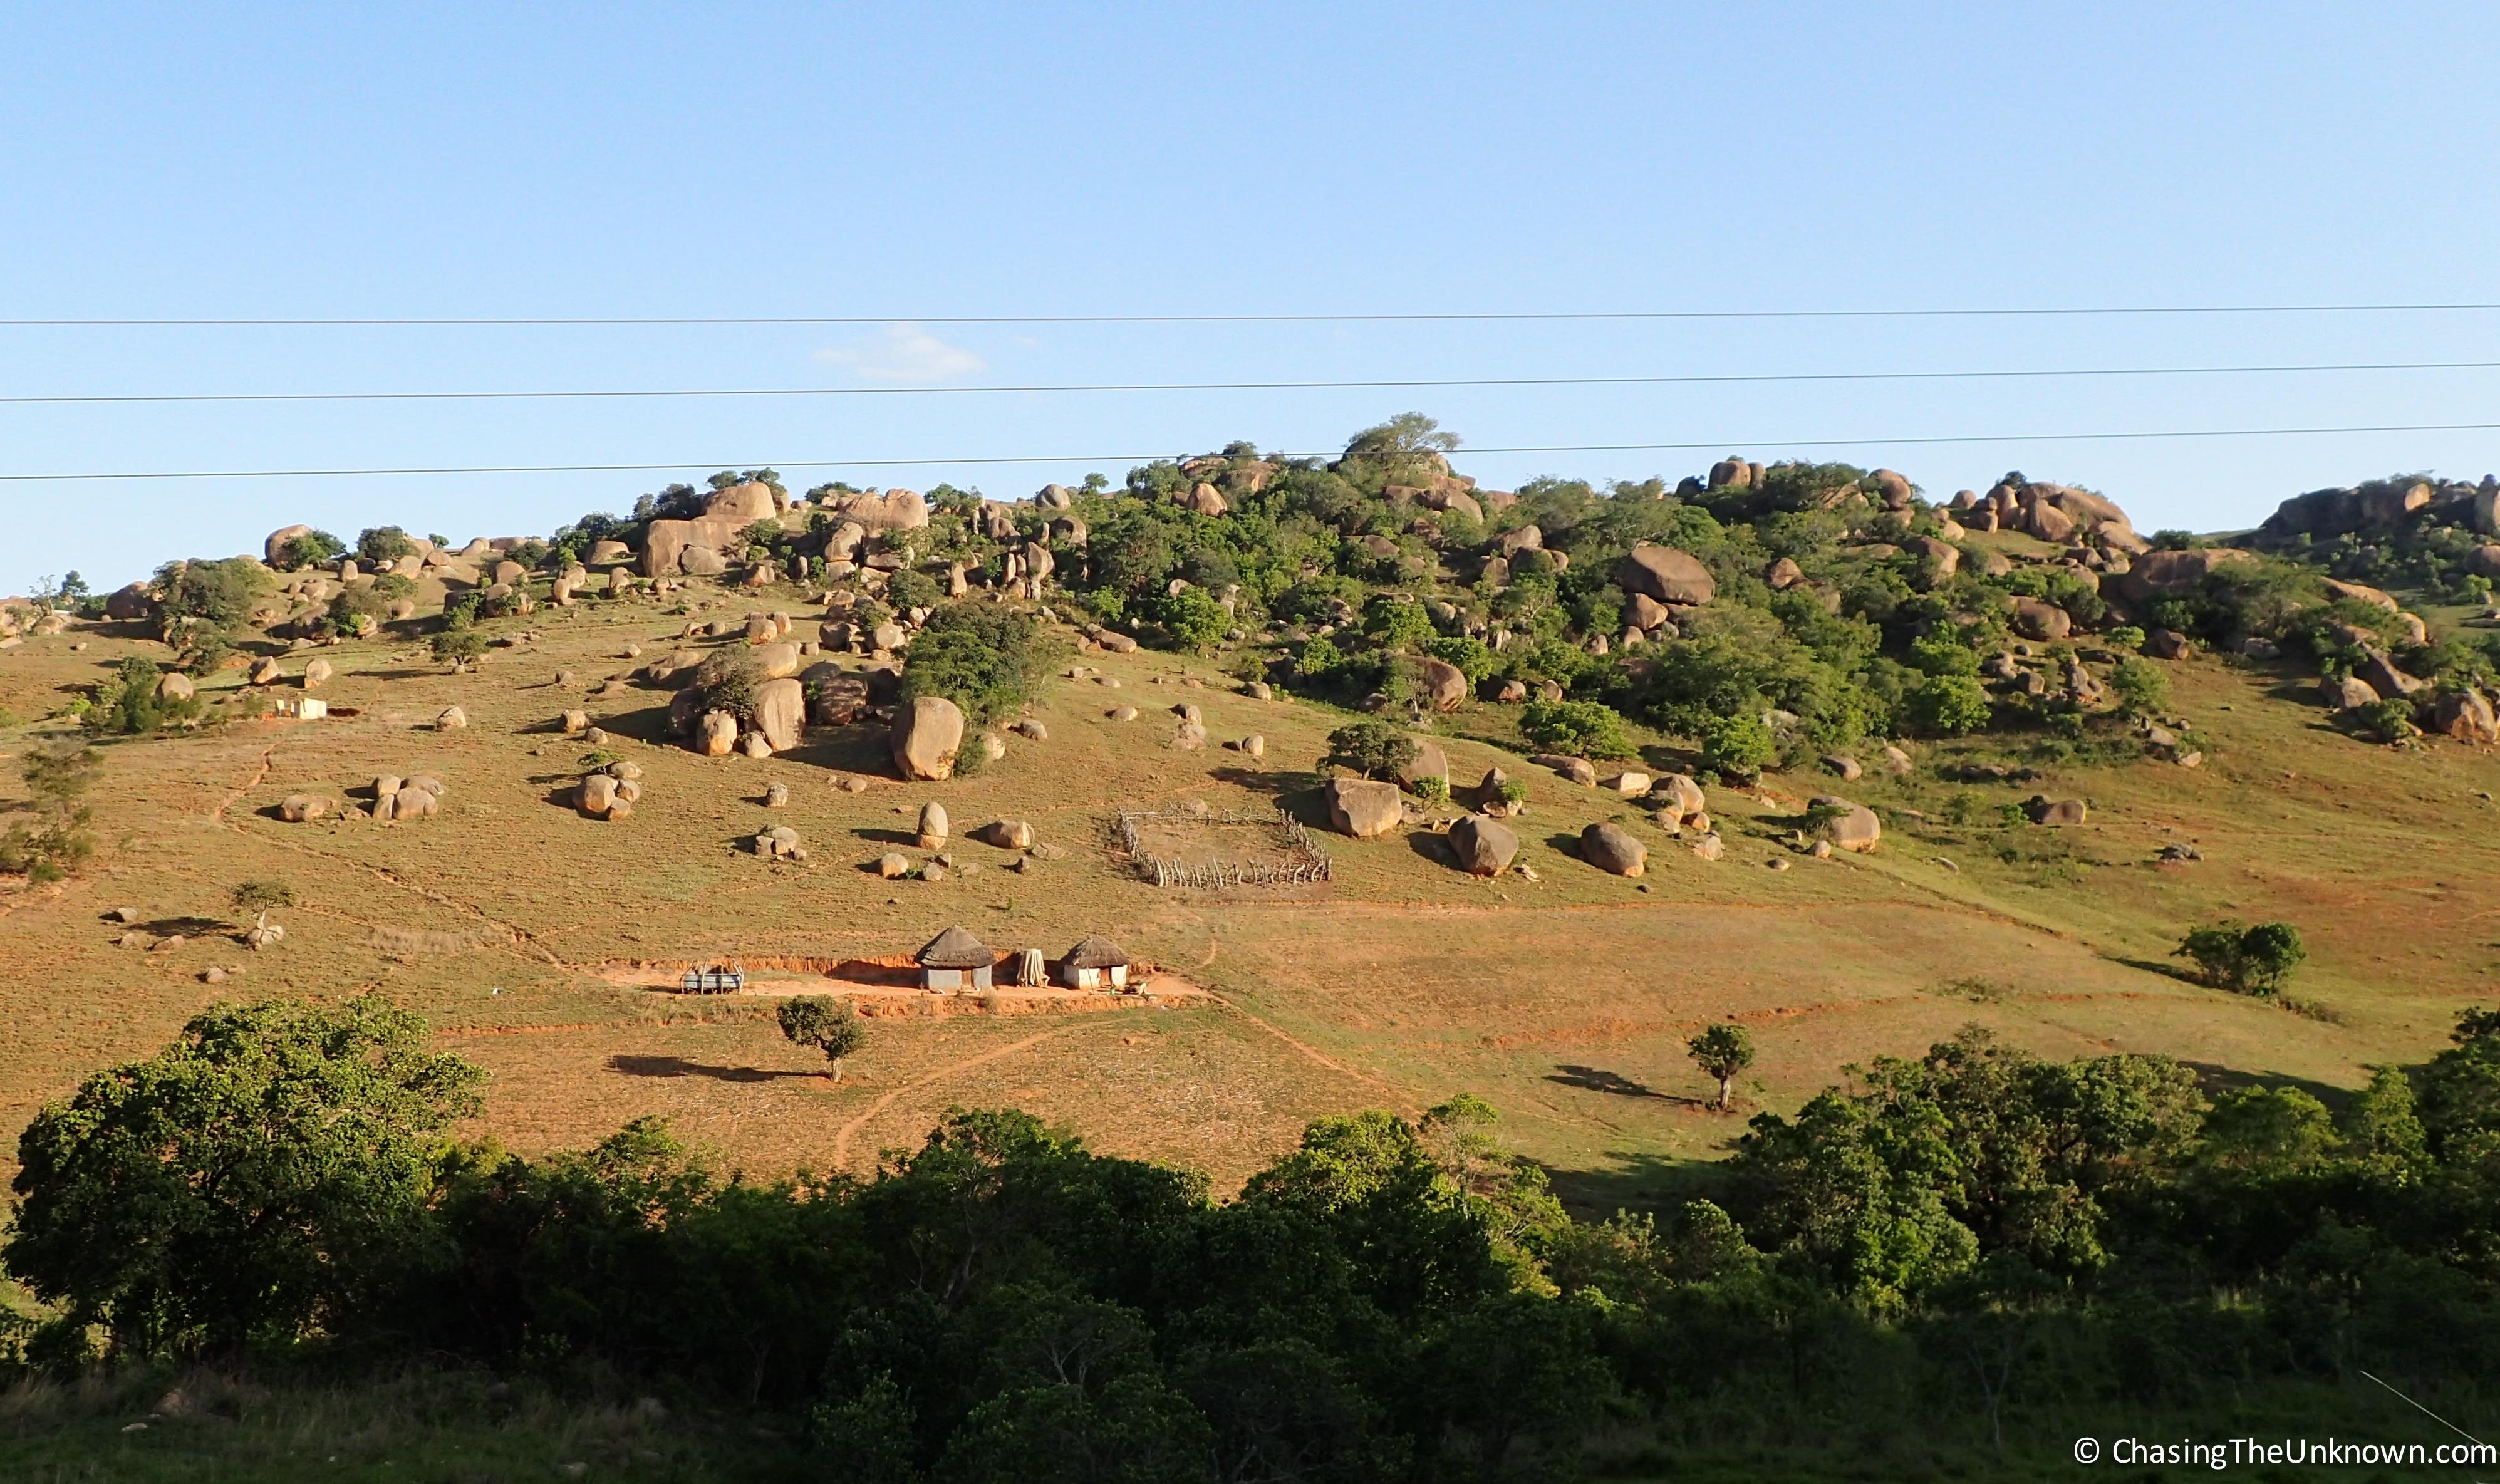 Swaziland-btwn-Piggs-Peak-Mbabane